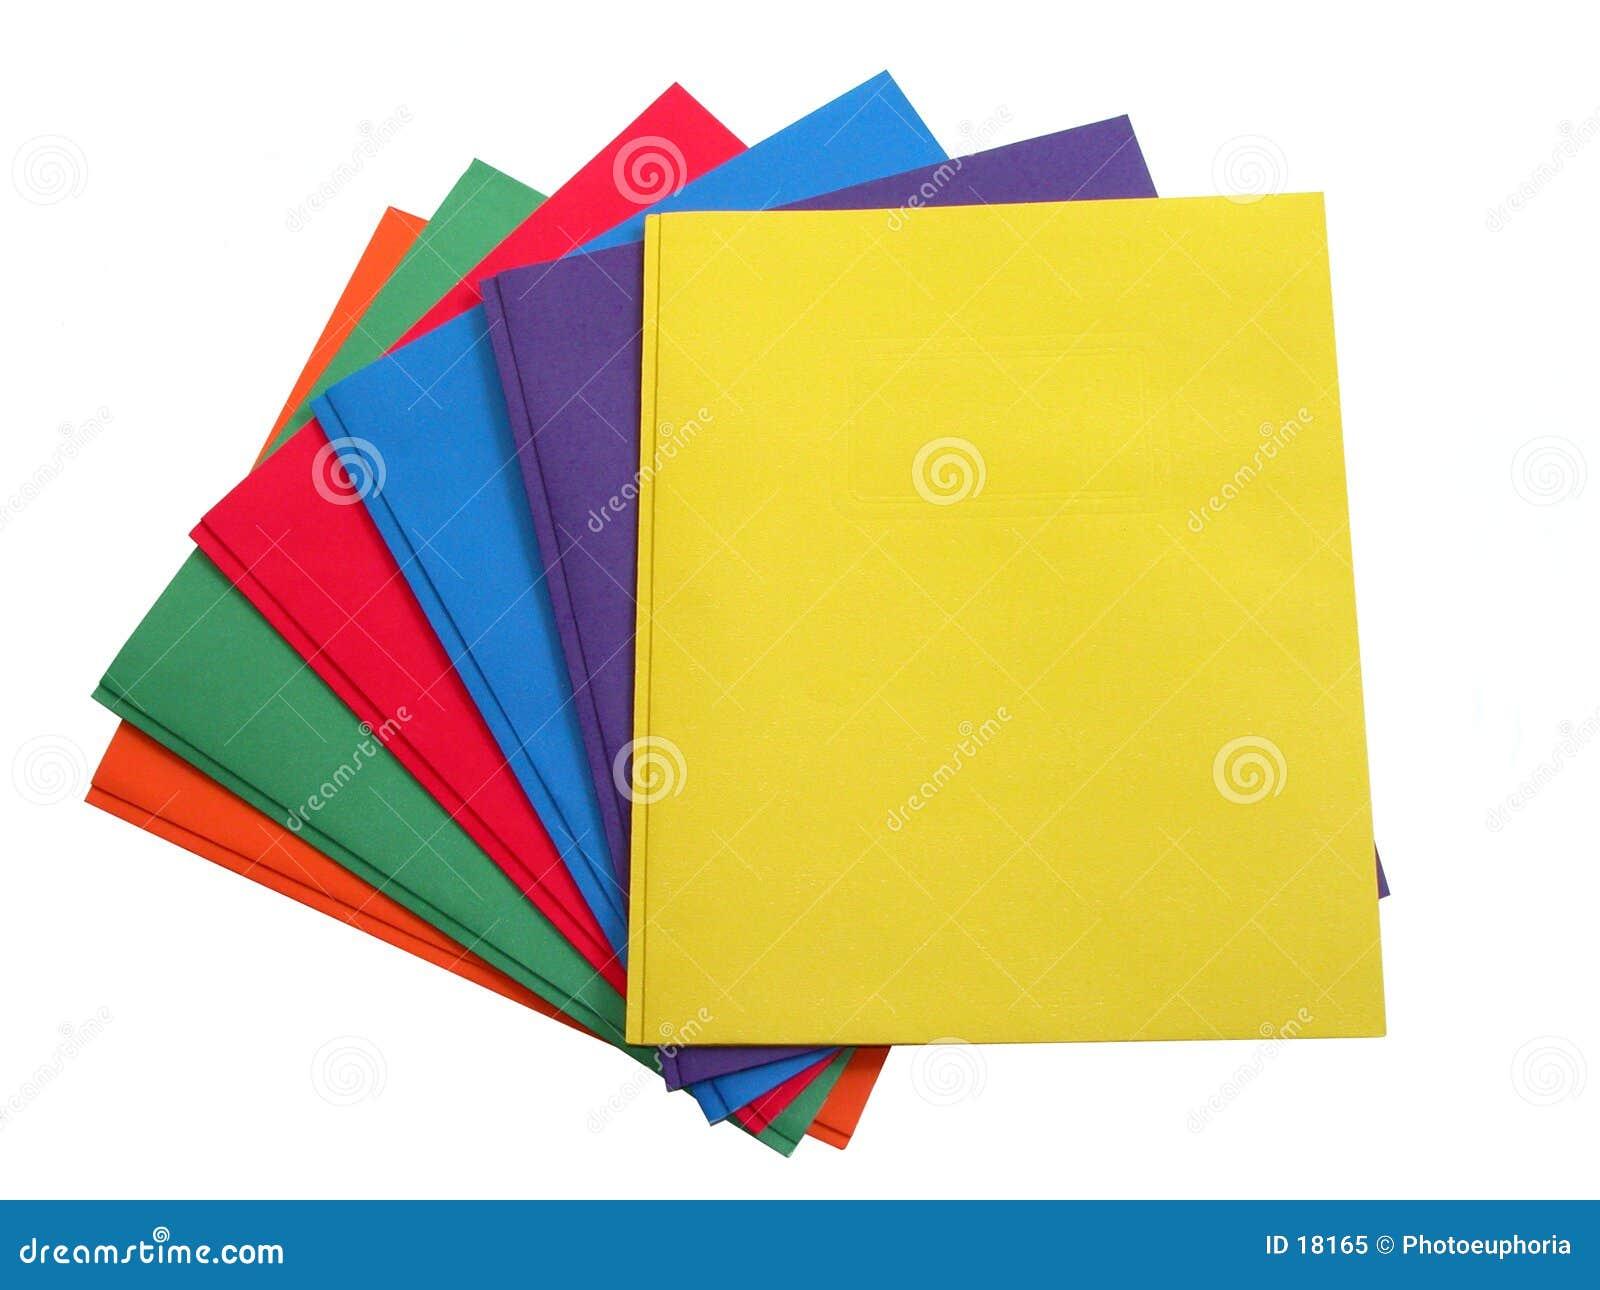 School & Office: Stack of Multi Colored Folders